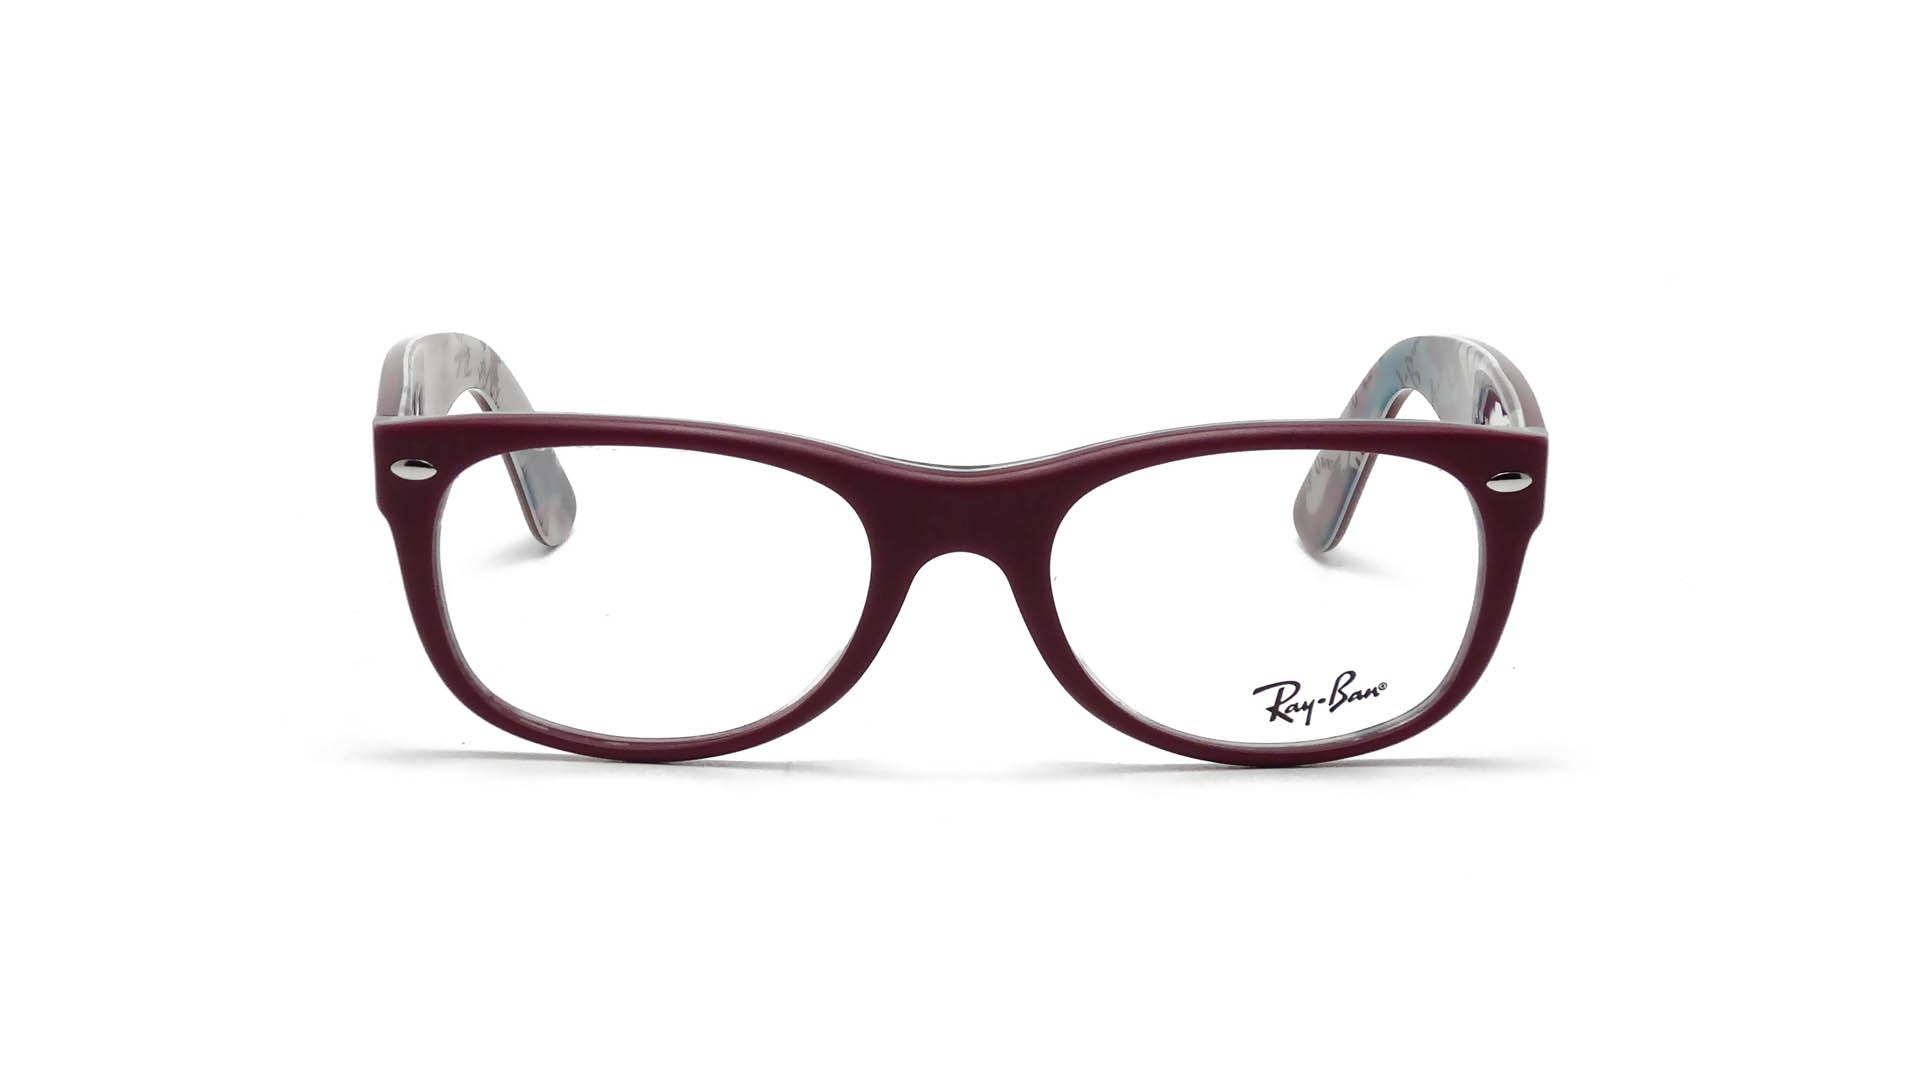 Eyeglasses Frames Wayfarer : Ray Ban New Wayfarer Eyeglass Frames - Highgate Park